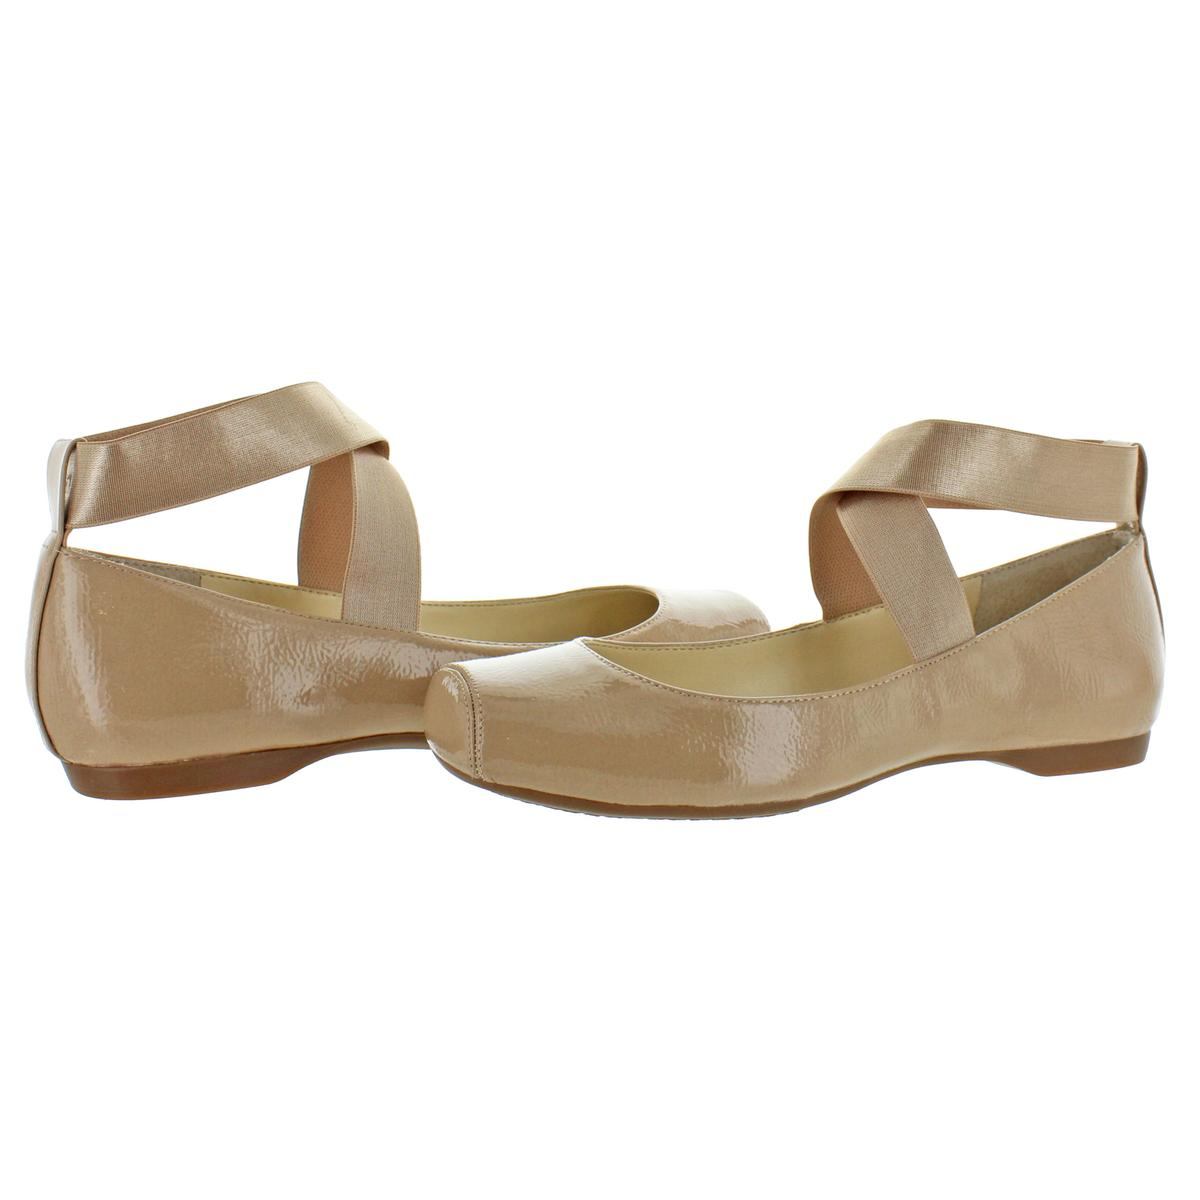 Jessica-Simpson-Women-039-s-Mandalaye-Square-Toe-Ankle-Wrap-Ballet-Flats thumbnail 20